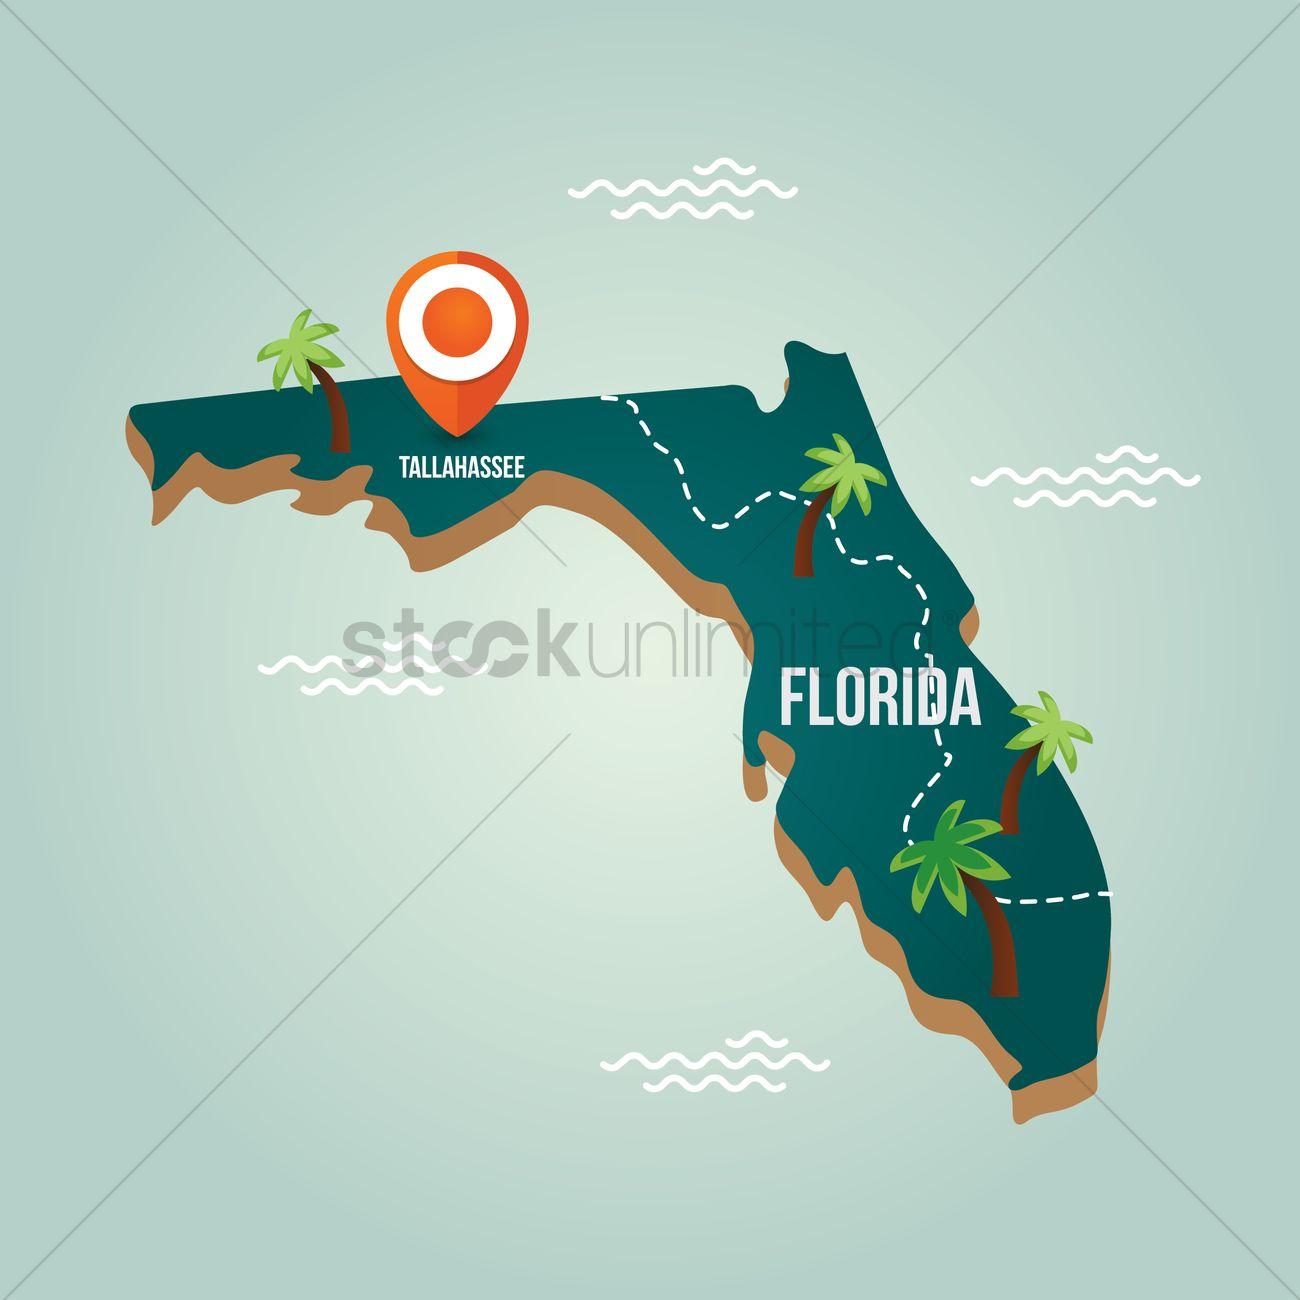 Flrida Map on nevada map, florida lakes, florida weather, florida flag, florida geography, florida beach, florida airports, new jersey map, florida information, florida directions, new york map, florida outline, florida from space, north carolina map, florida food, michigan map, minnesota map, florida cities, arkansas map, illinois map, florida coast, missouri map, pennsylvania map, florida christmas, florida attractions, florida resorts, florida symbols, idaho map, florida counties, florida rivers, maryland map, florida postcard, wisconsin map, colorado map, kansas map, tennessee map,